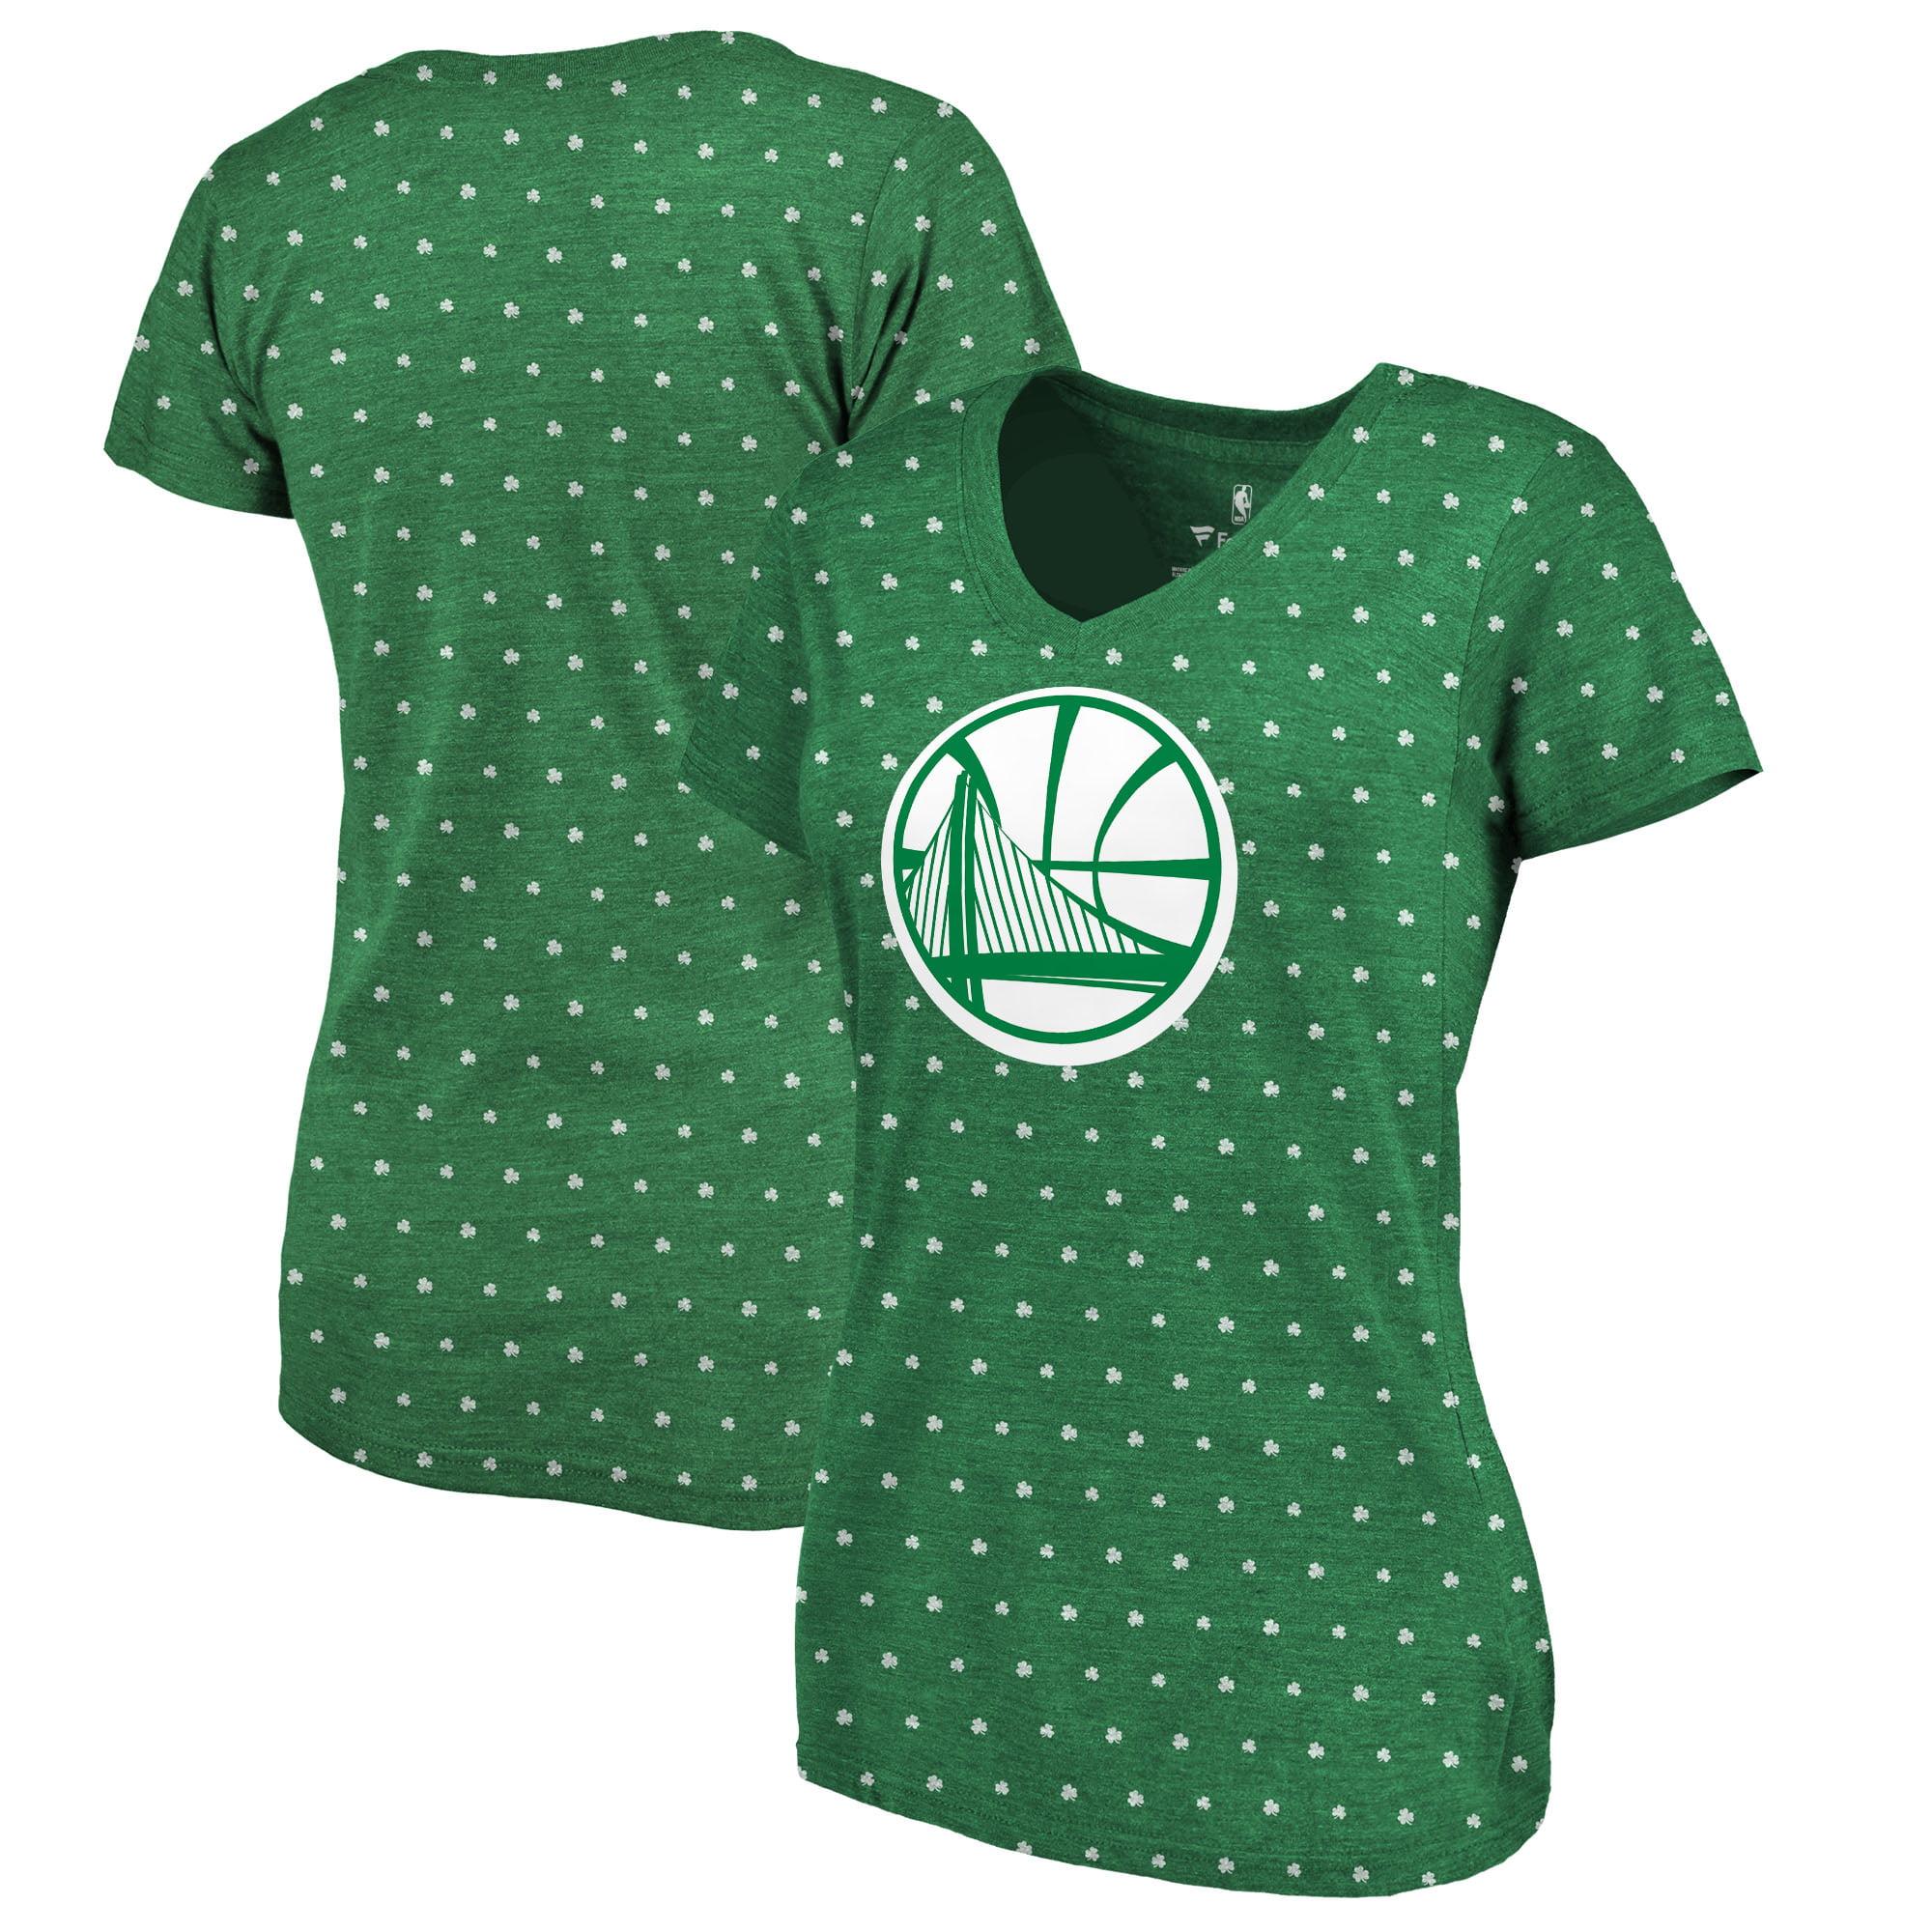 Golden State Warriors Fanatics Branded Women's All Irish All Over Print V-Neck T-Shirt - Kelly Green